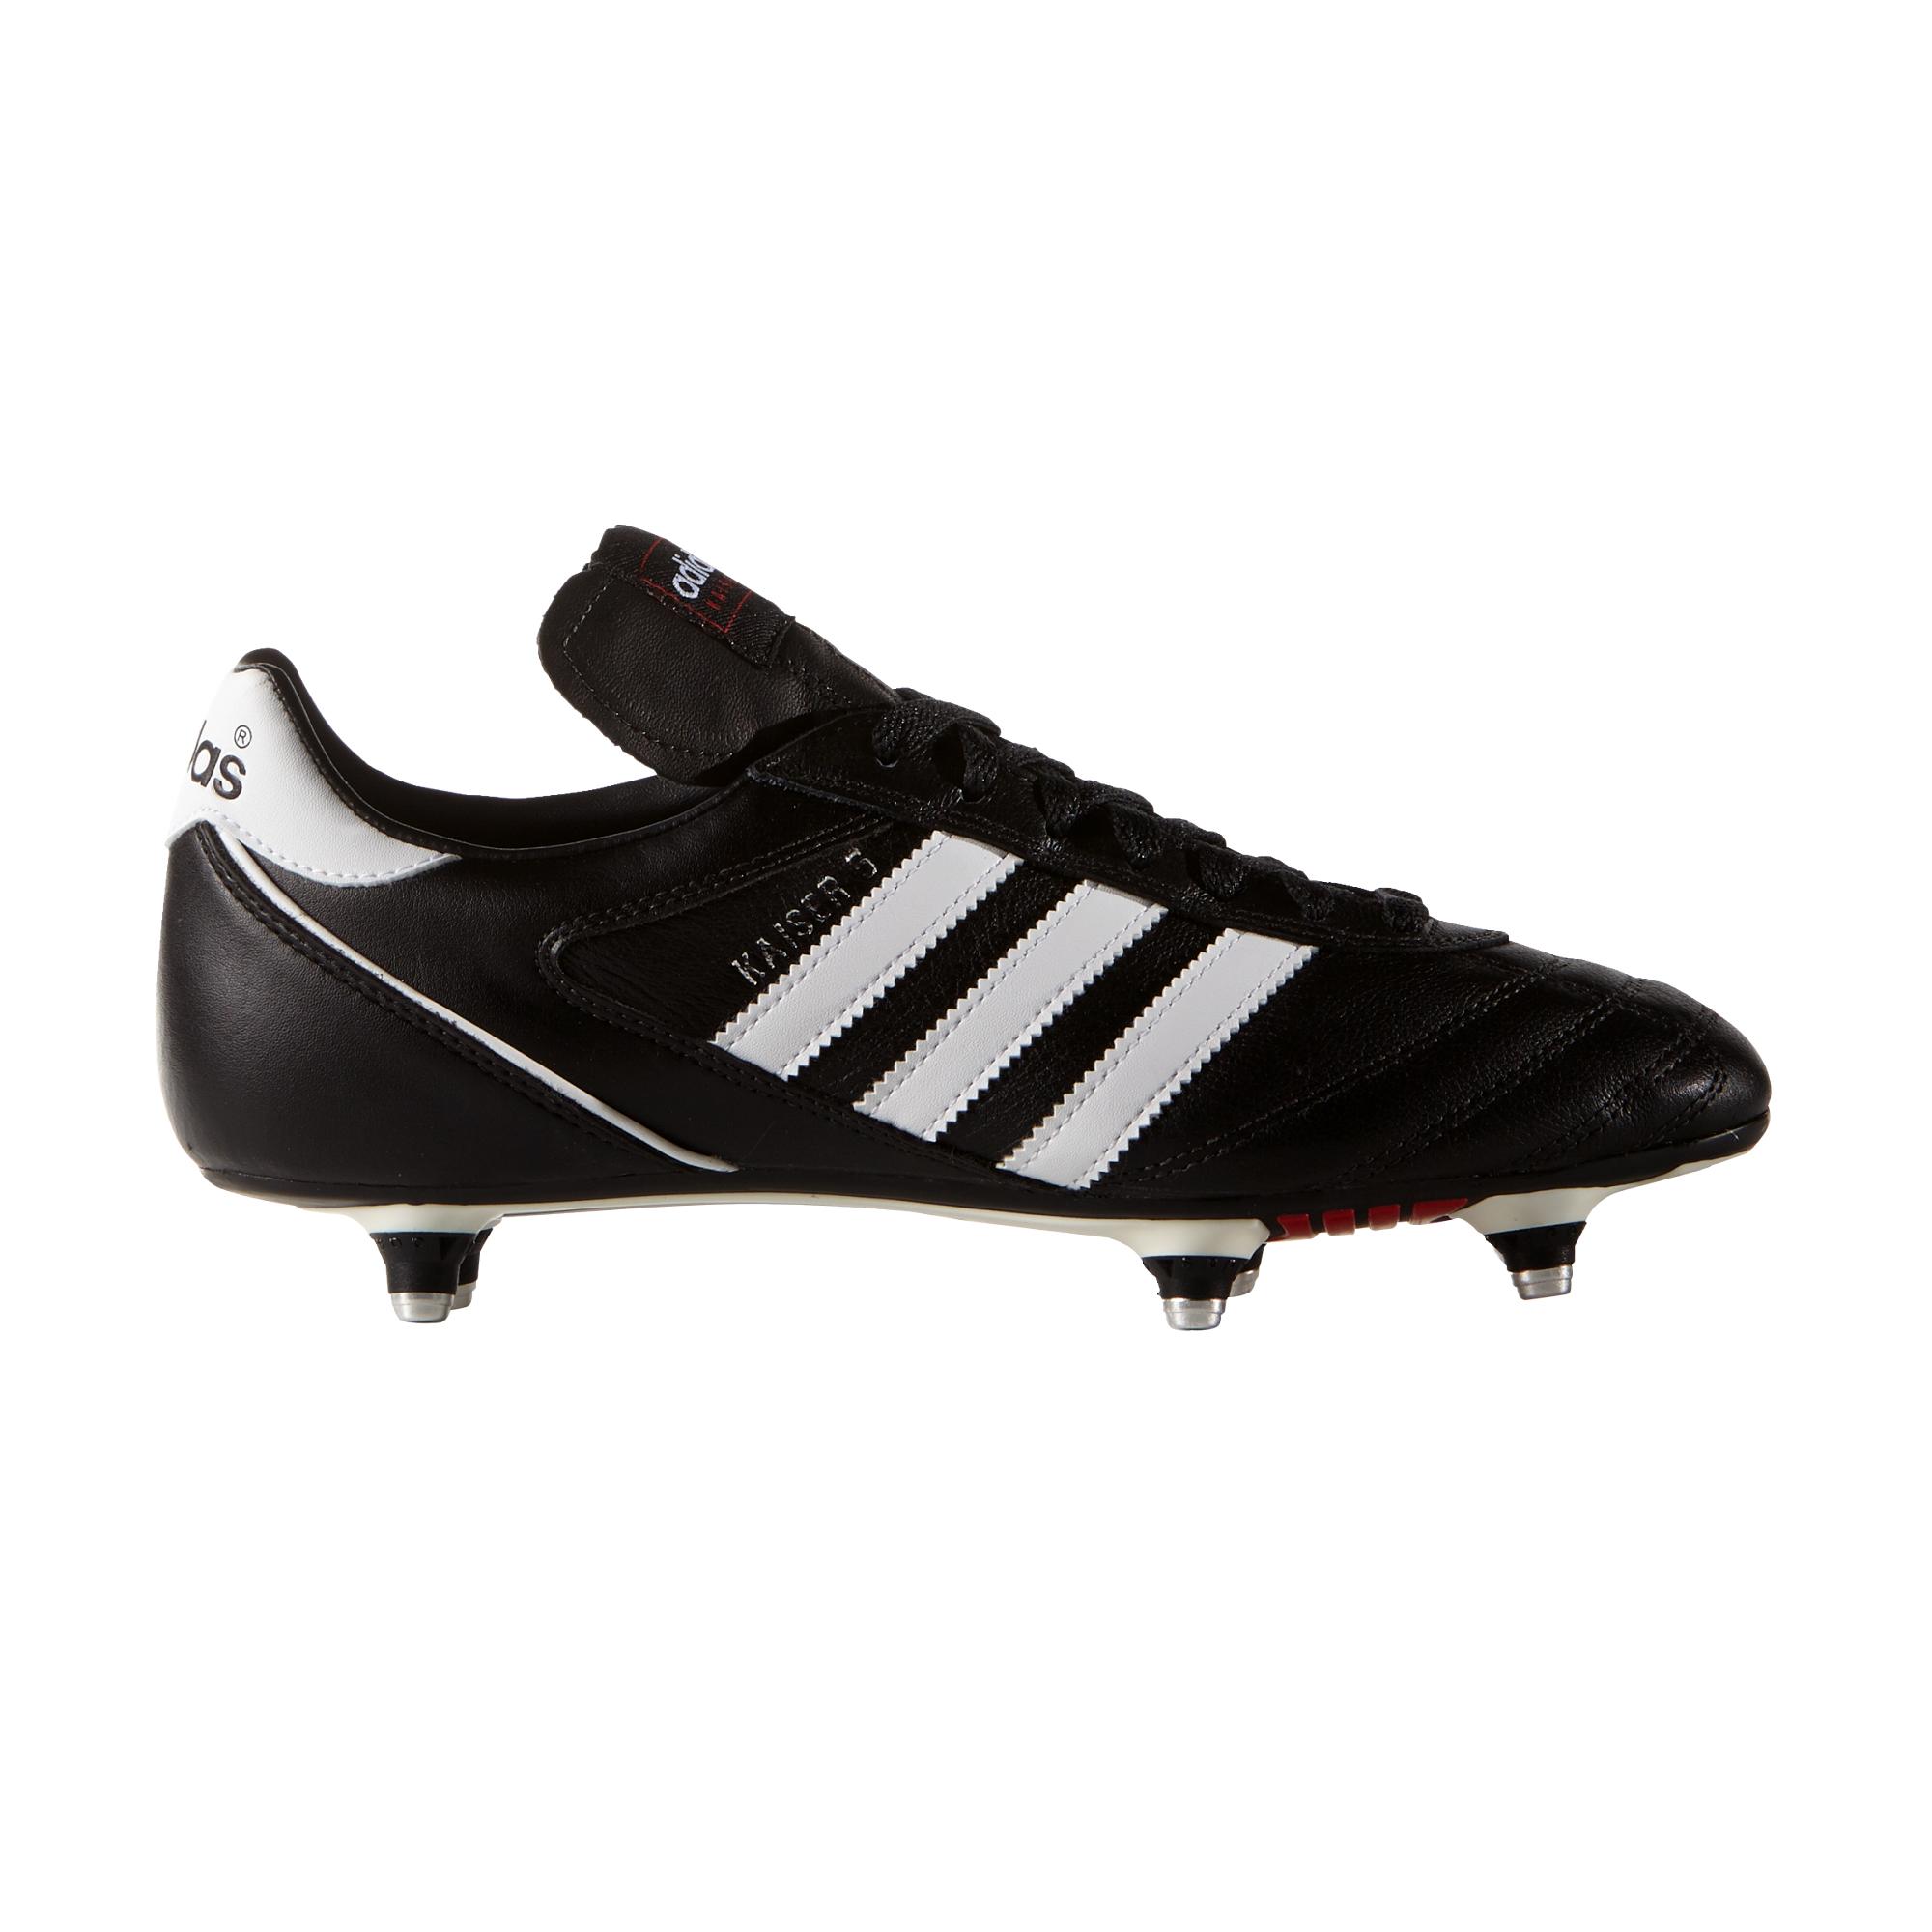 adidas kaiser 5 cup sg soft ground mens football boot. Black Bedroom Furniture Sets. Home Design Ideas